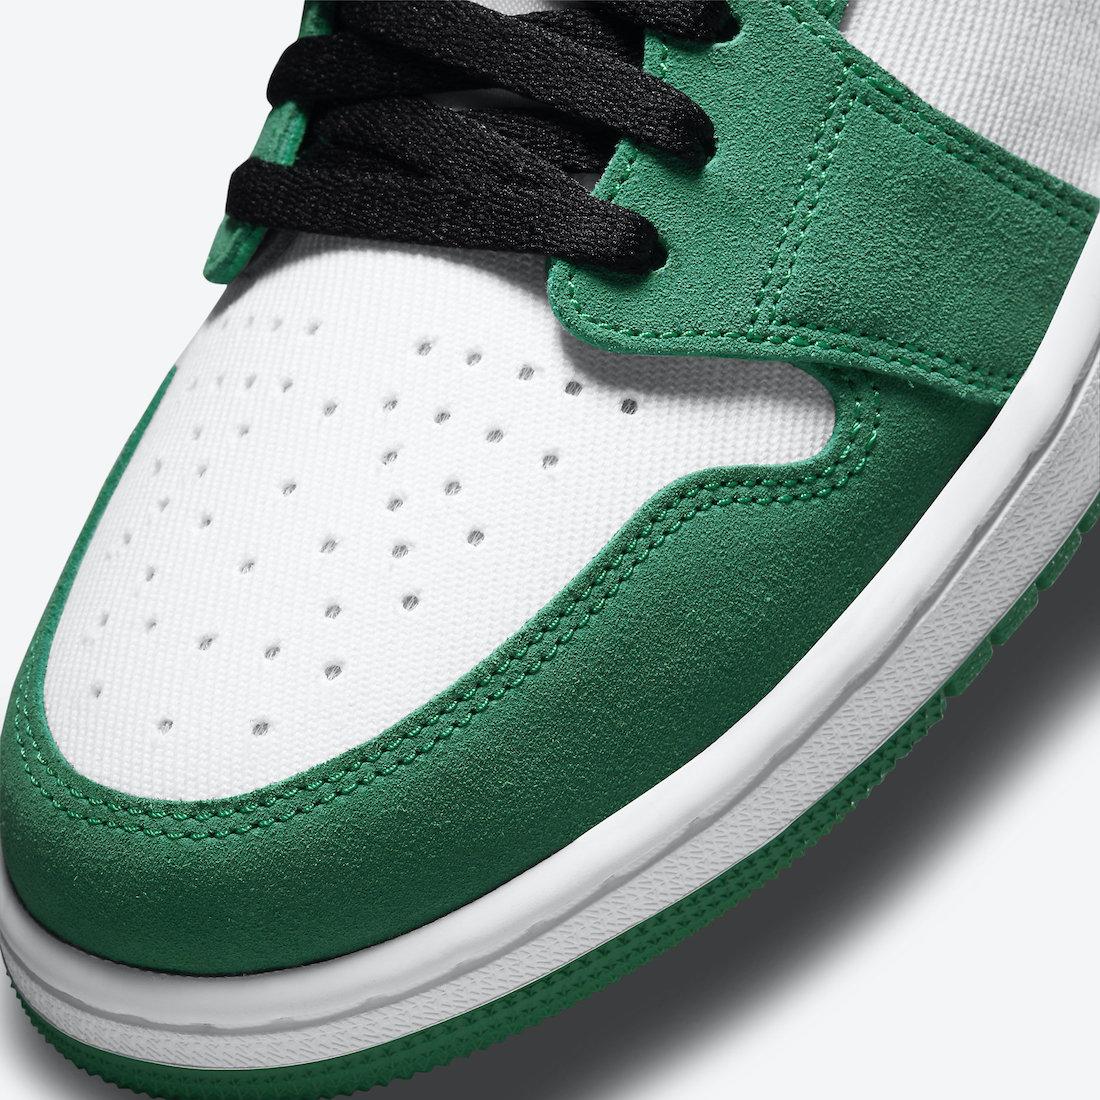 Air-Jordan-1-Zoom-CMFT-Stadium-Green-CT0978-300-Release-Date-Price-6